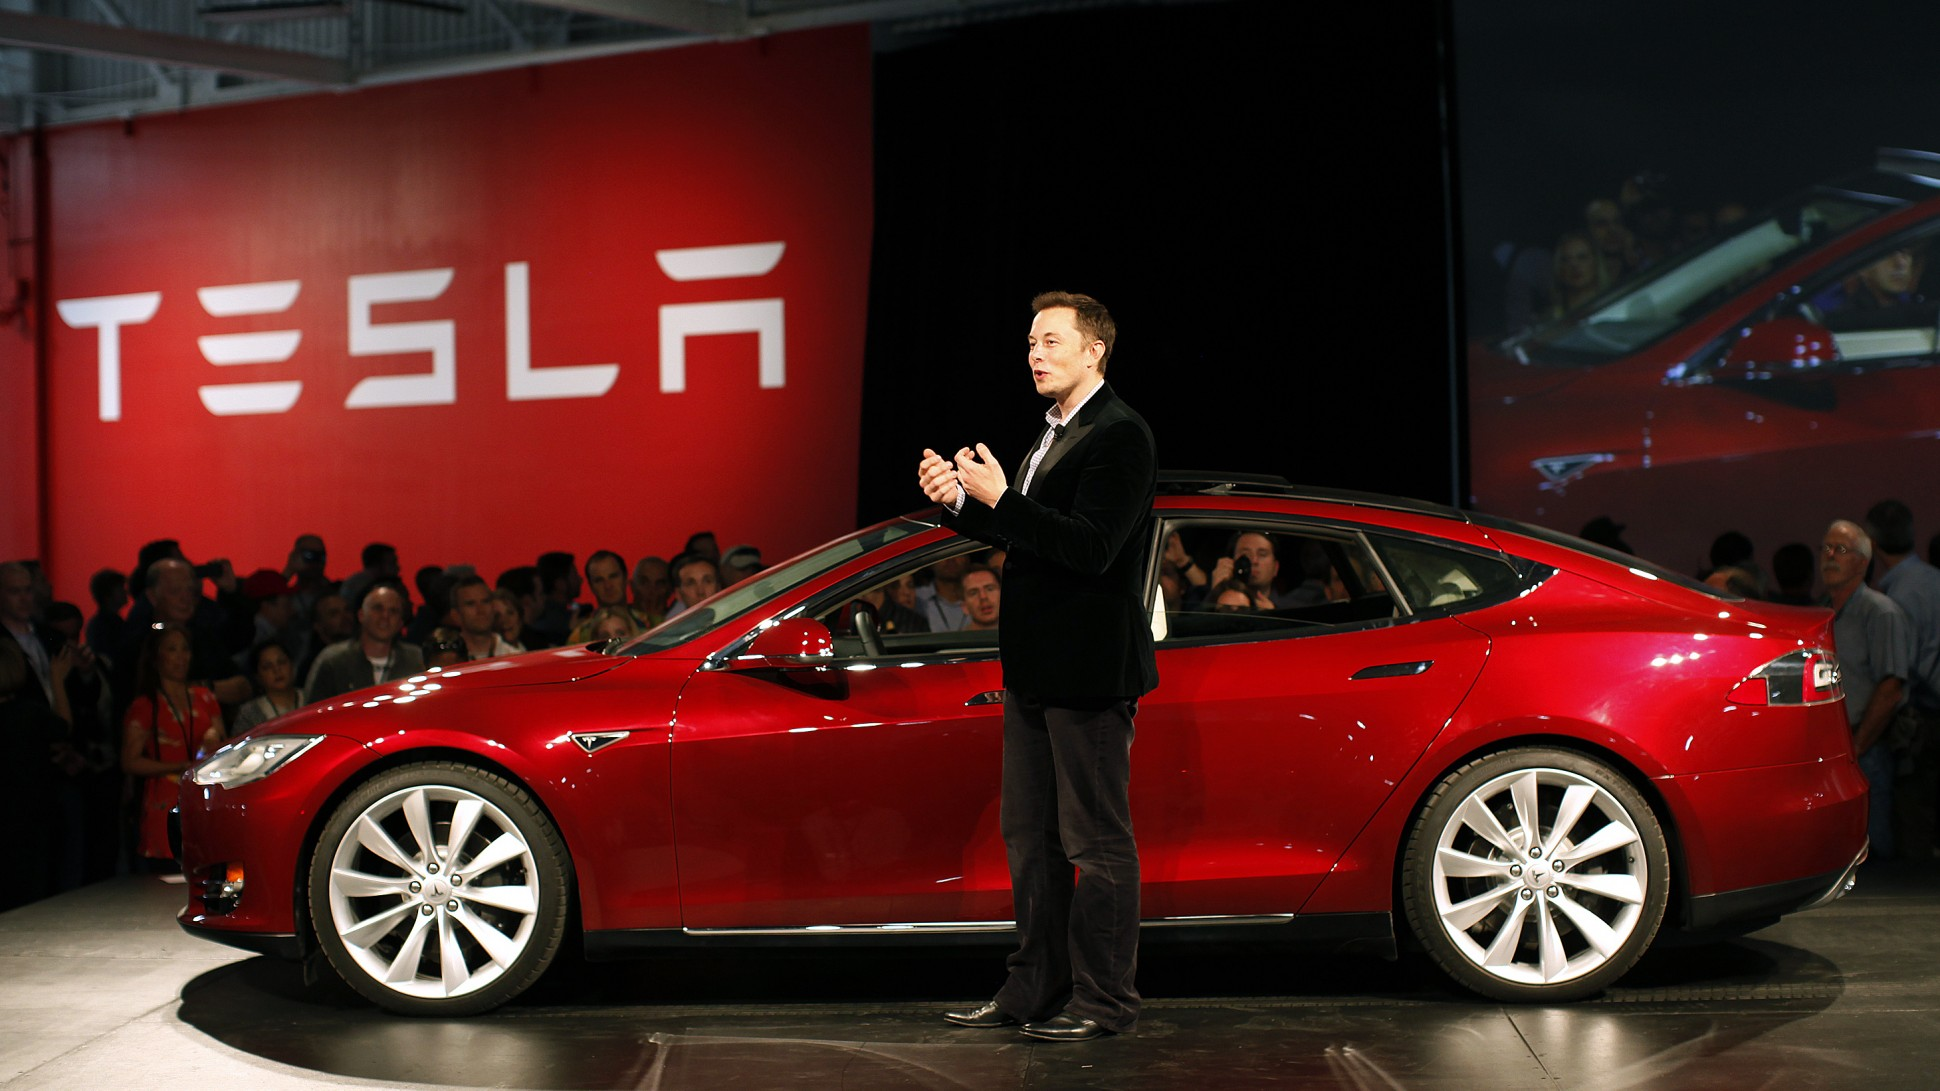 Un gran científico: Elon Musk - Conócelo